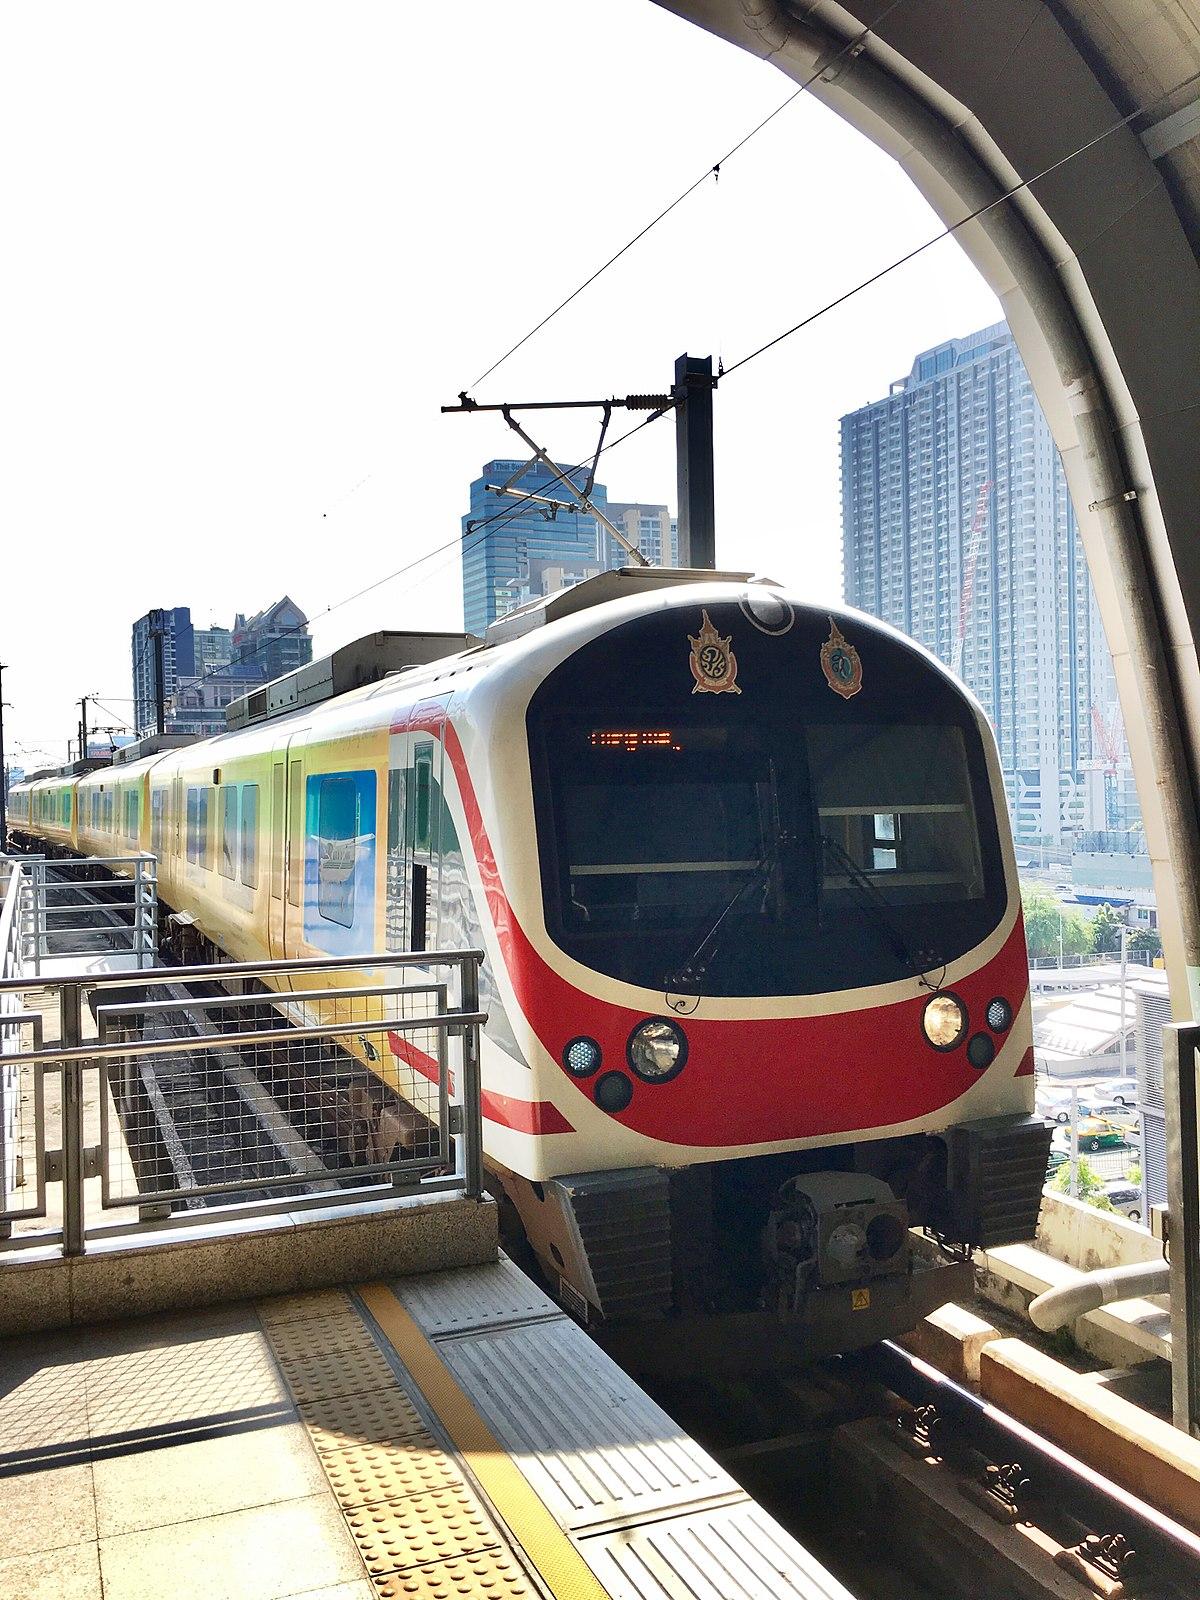 Transportasi Umum Wikipedia Bahasa Indonesia